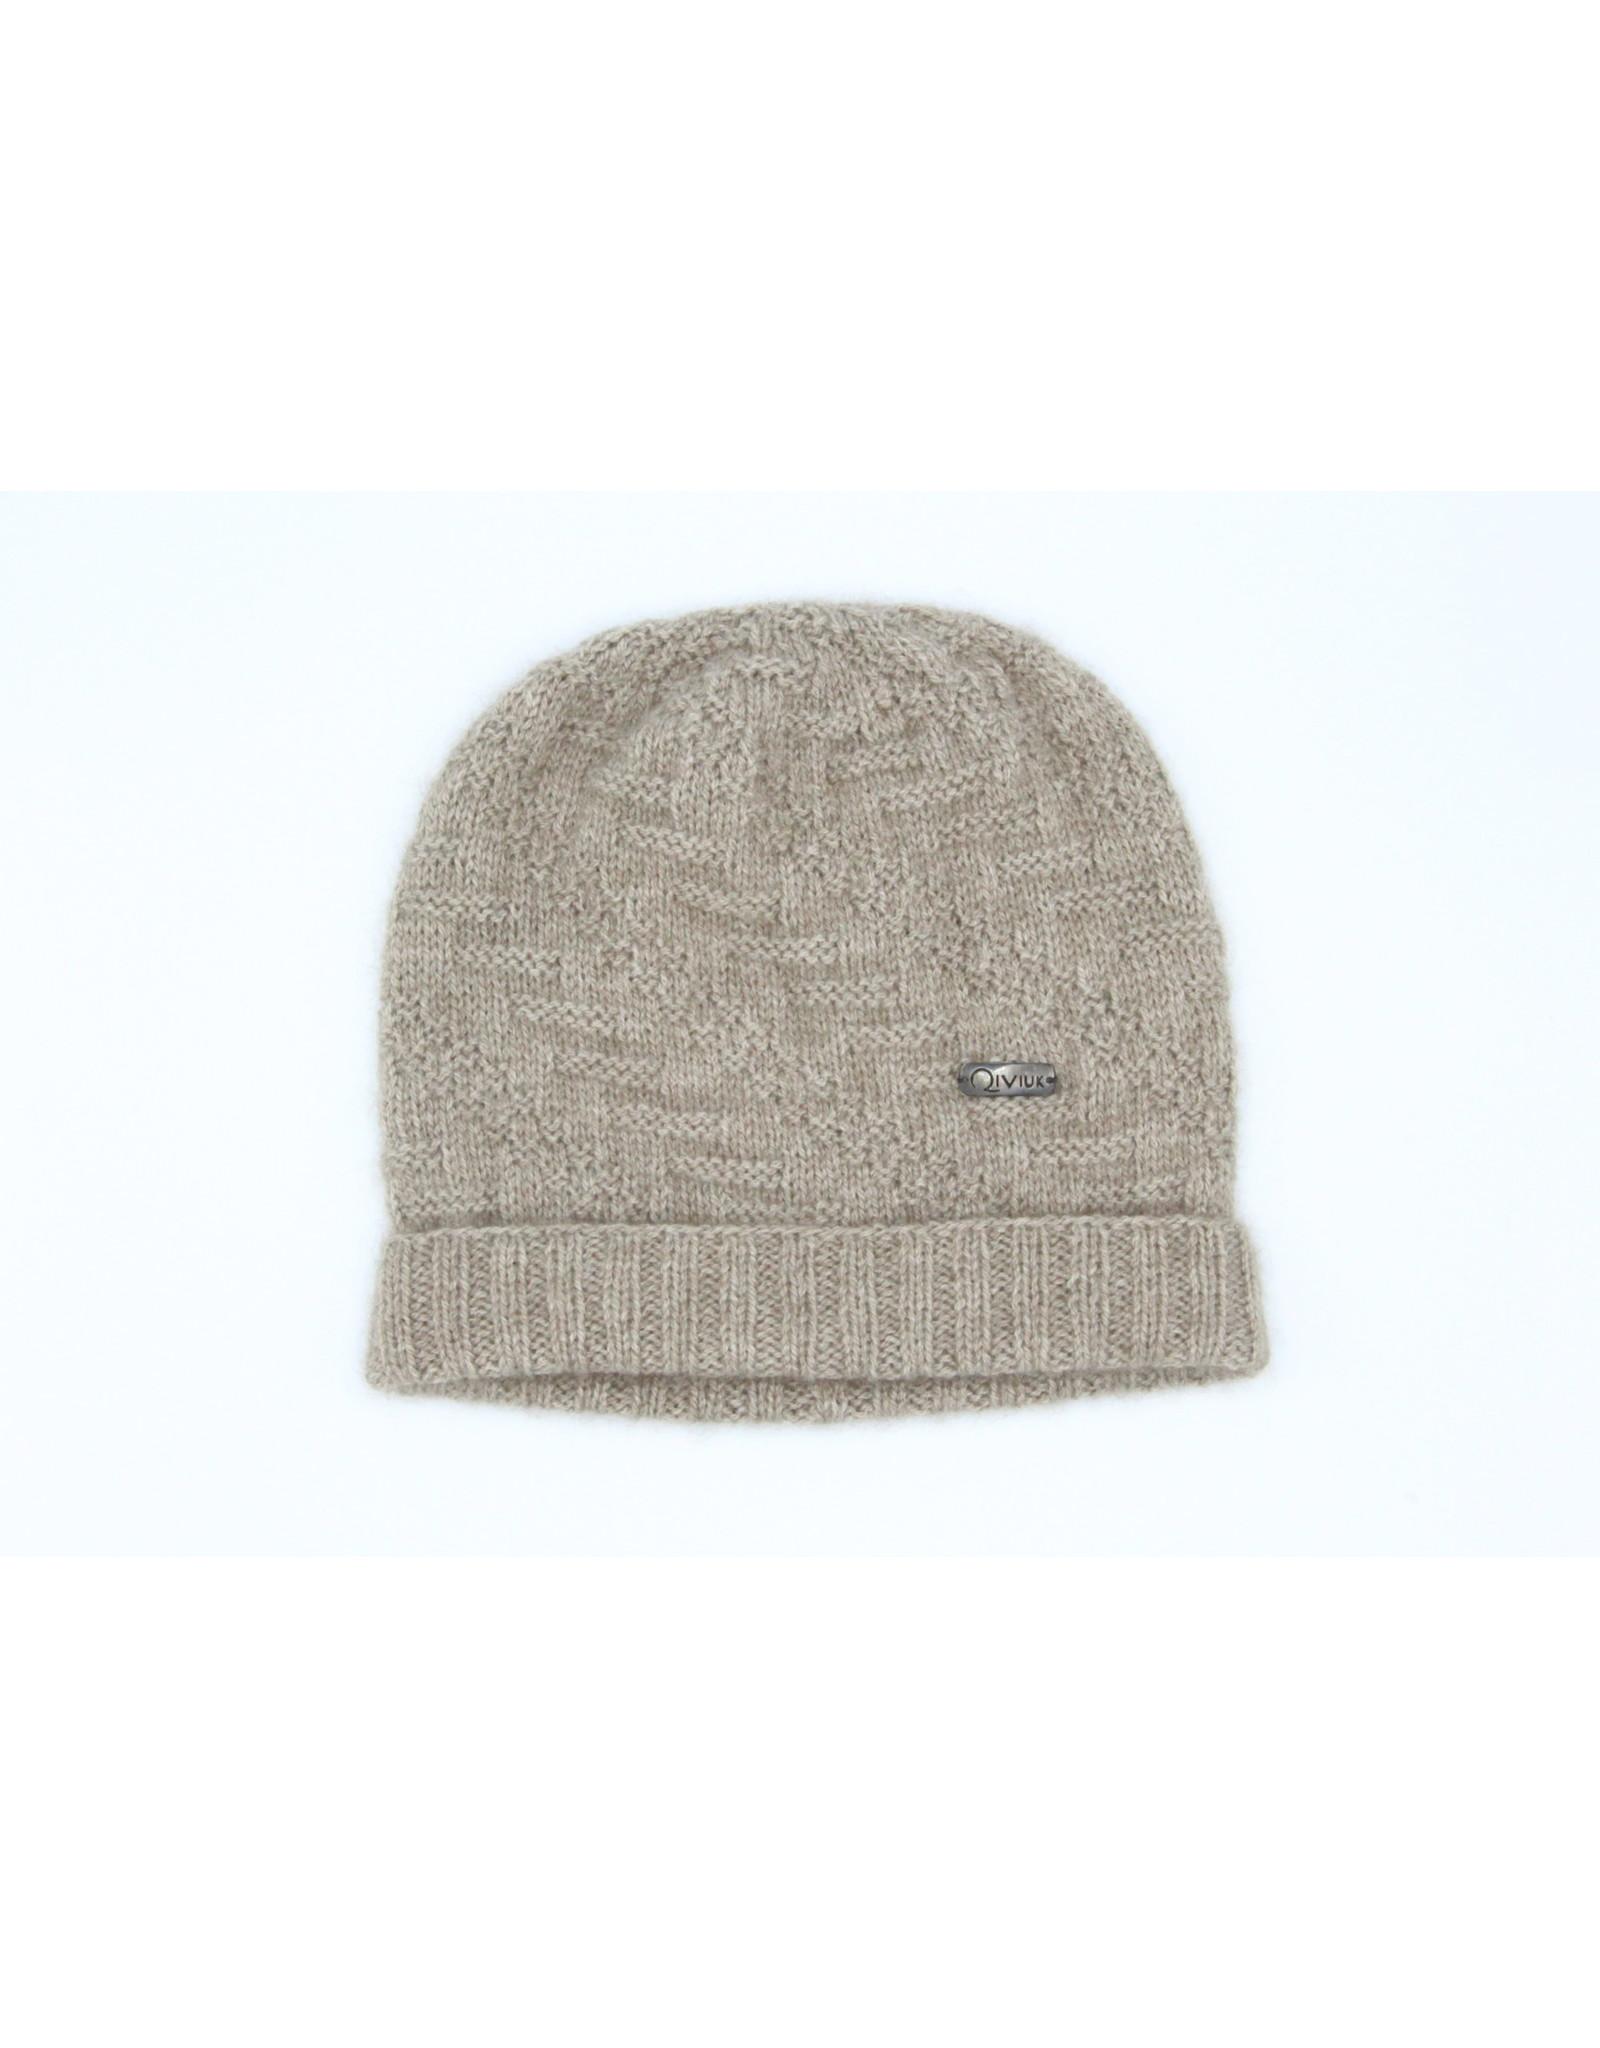 Casaca Hat - 45% Qiviuk 45% Merino 10% Silk